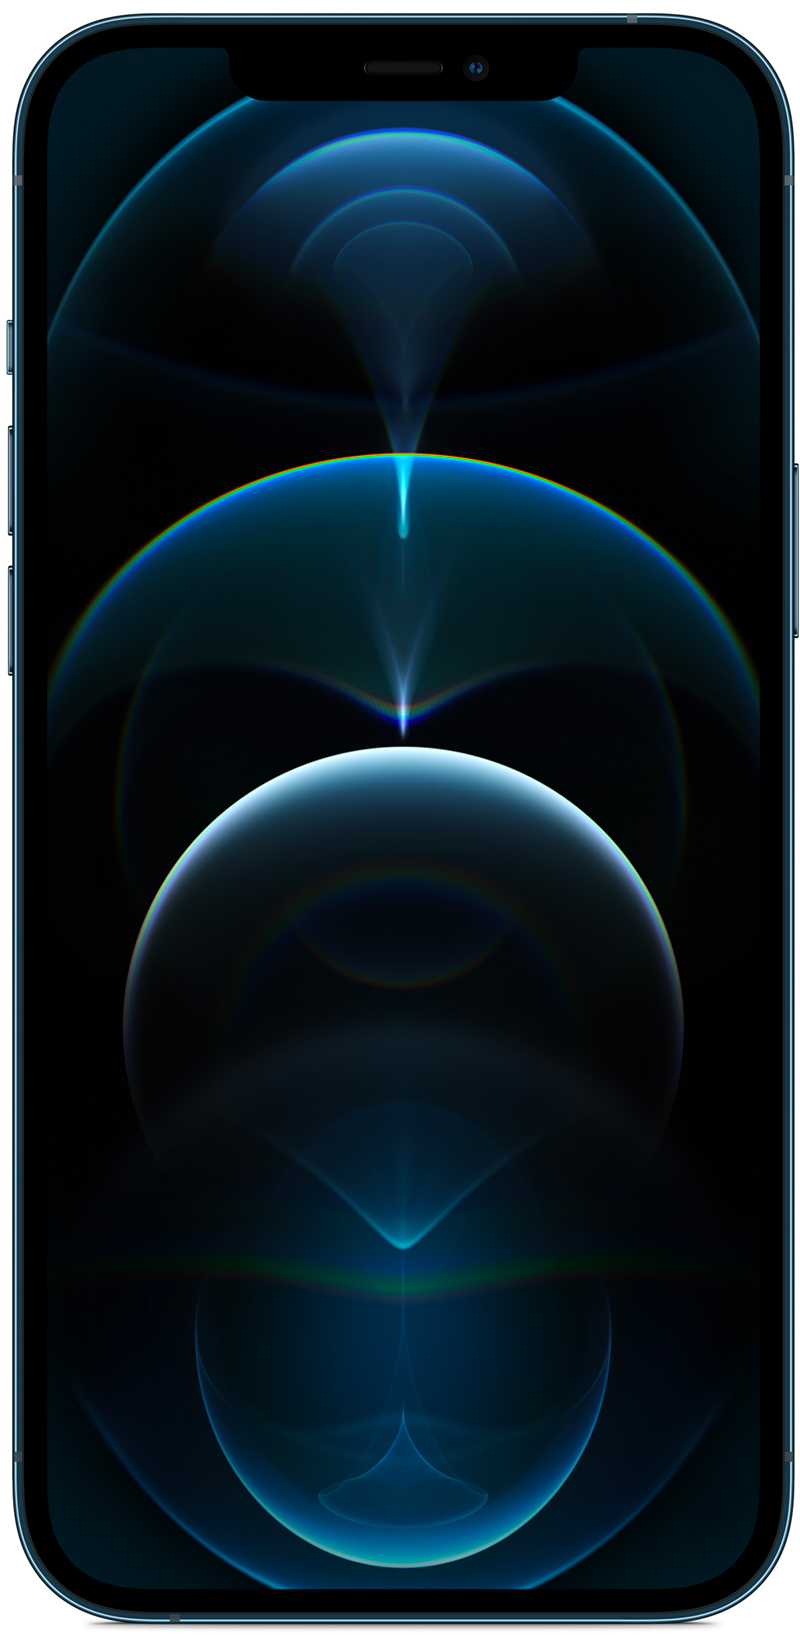 Apple iPhone 12 Pro Max bleu Pacifique 256Go